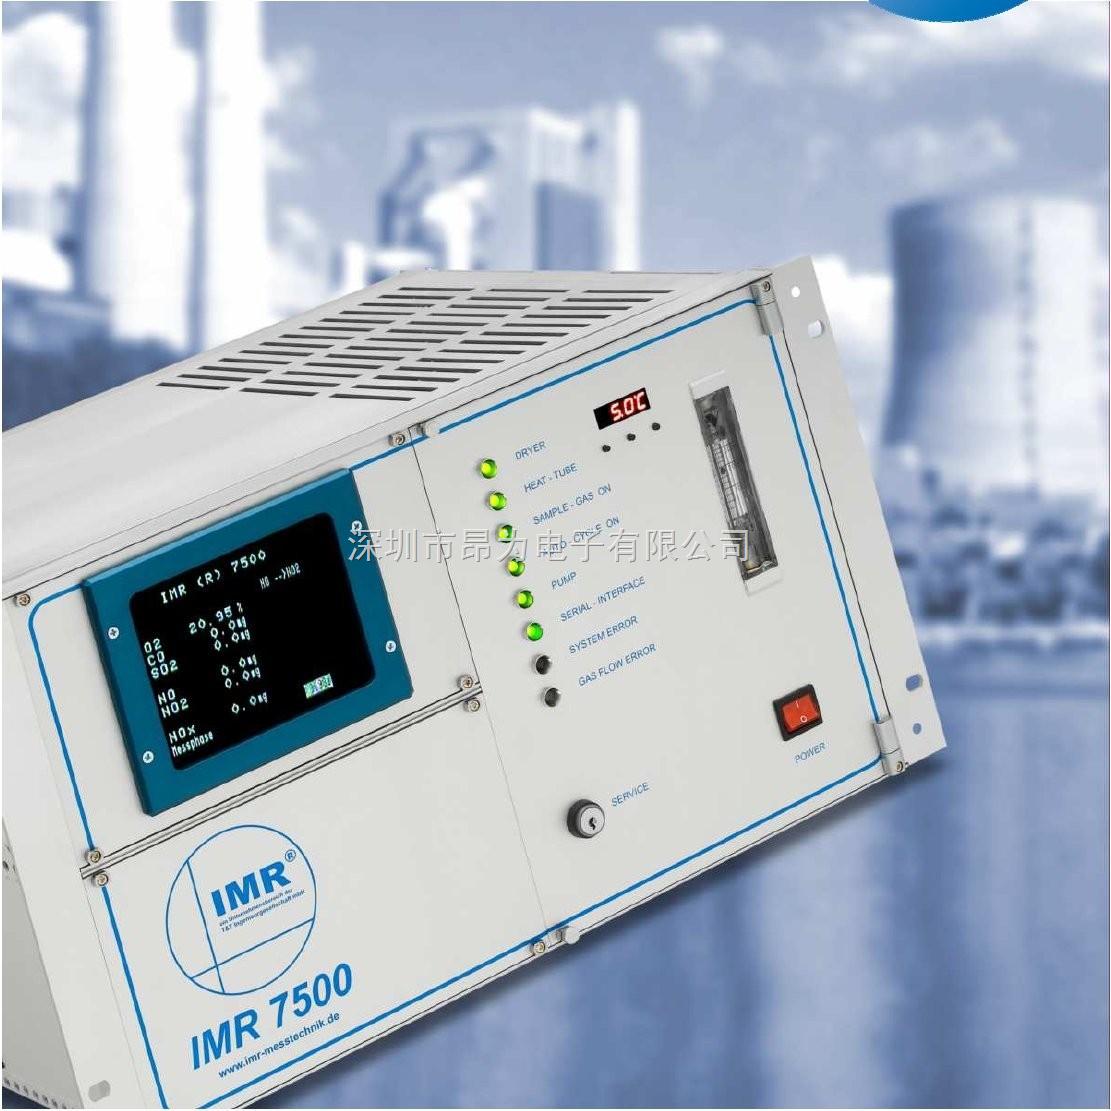 IMR 7500-连续排放监测系统(CEM) IMR 7500